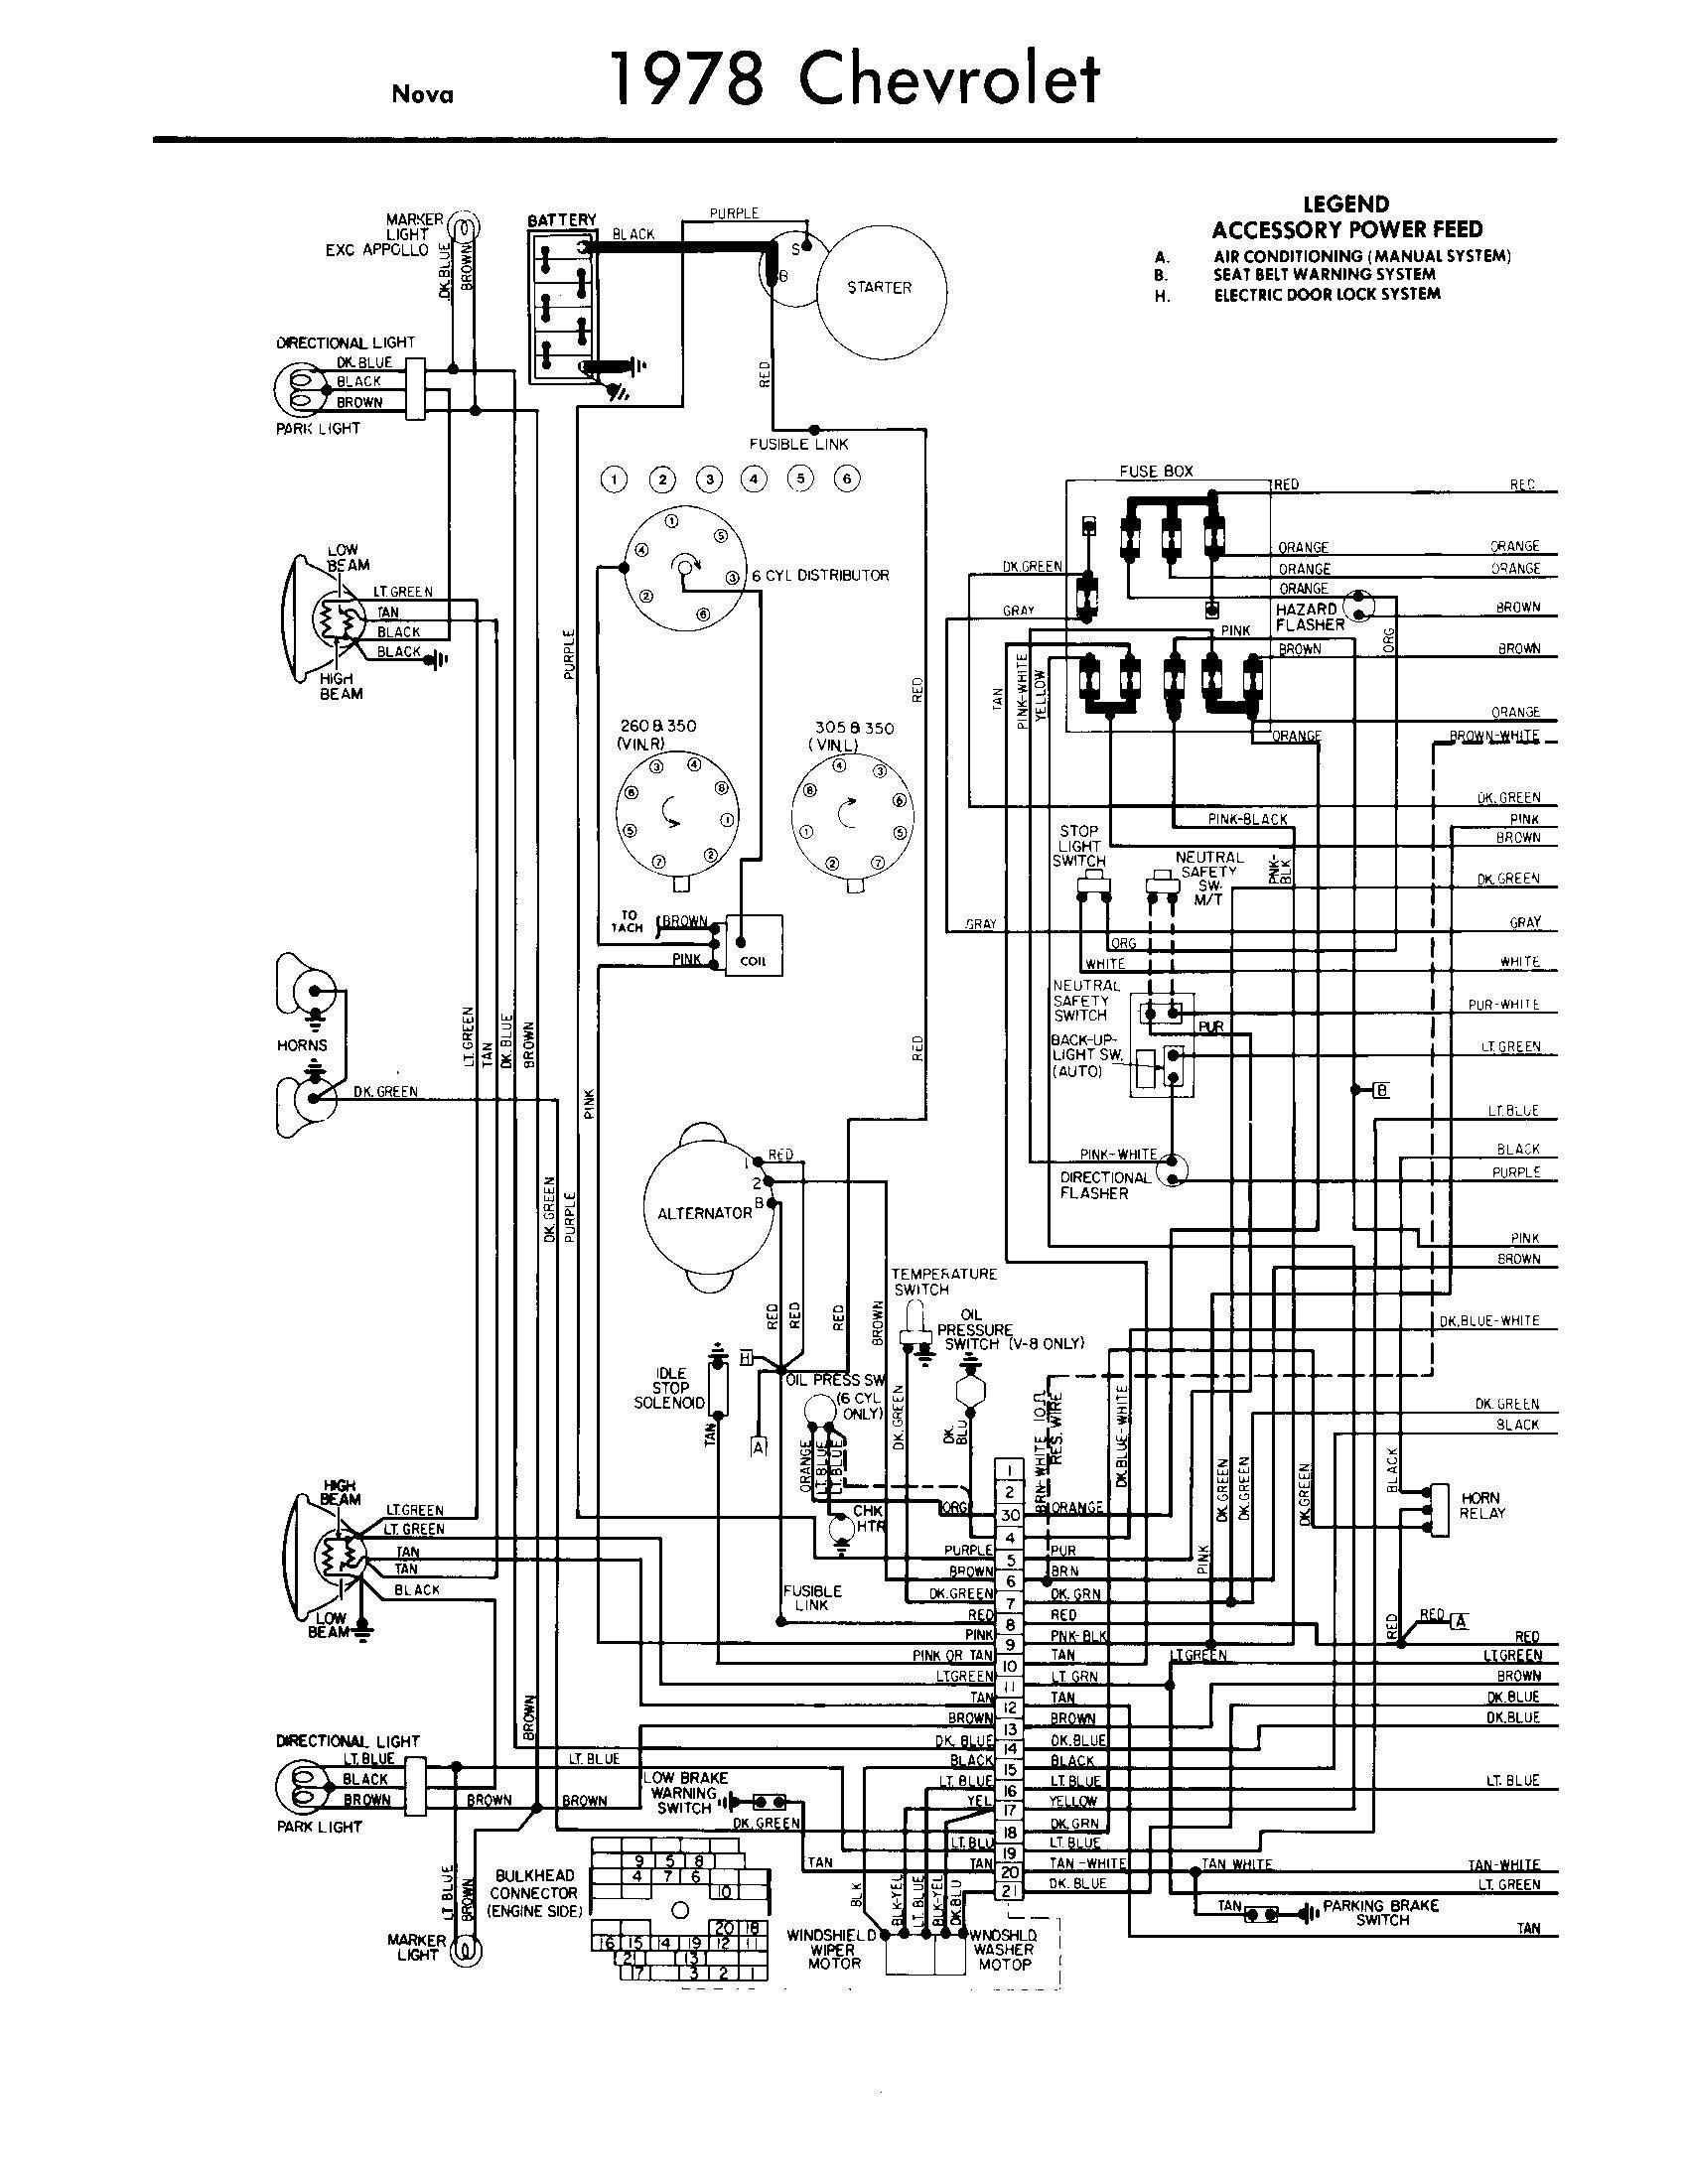 DIAGRAM] Mack Truck Alternator Wiring Diagram FULL Version HD Quality Wiring  Diagram - BUYRAREBOOKS.AMANDINE-BREVELAY.FRbuyrarebooks.amandine-brevelay.fr